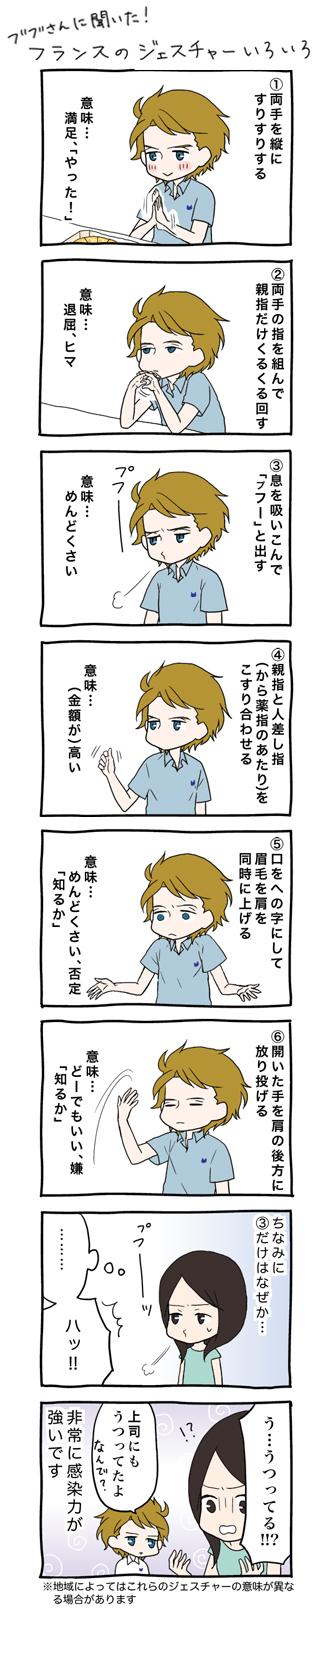 0098blog